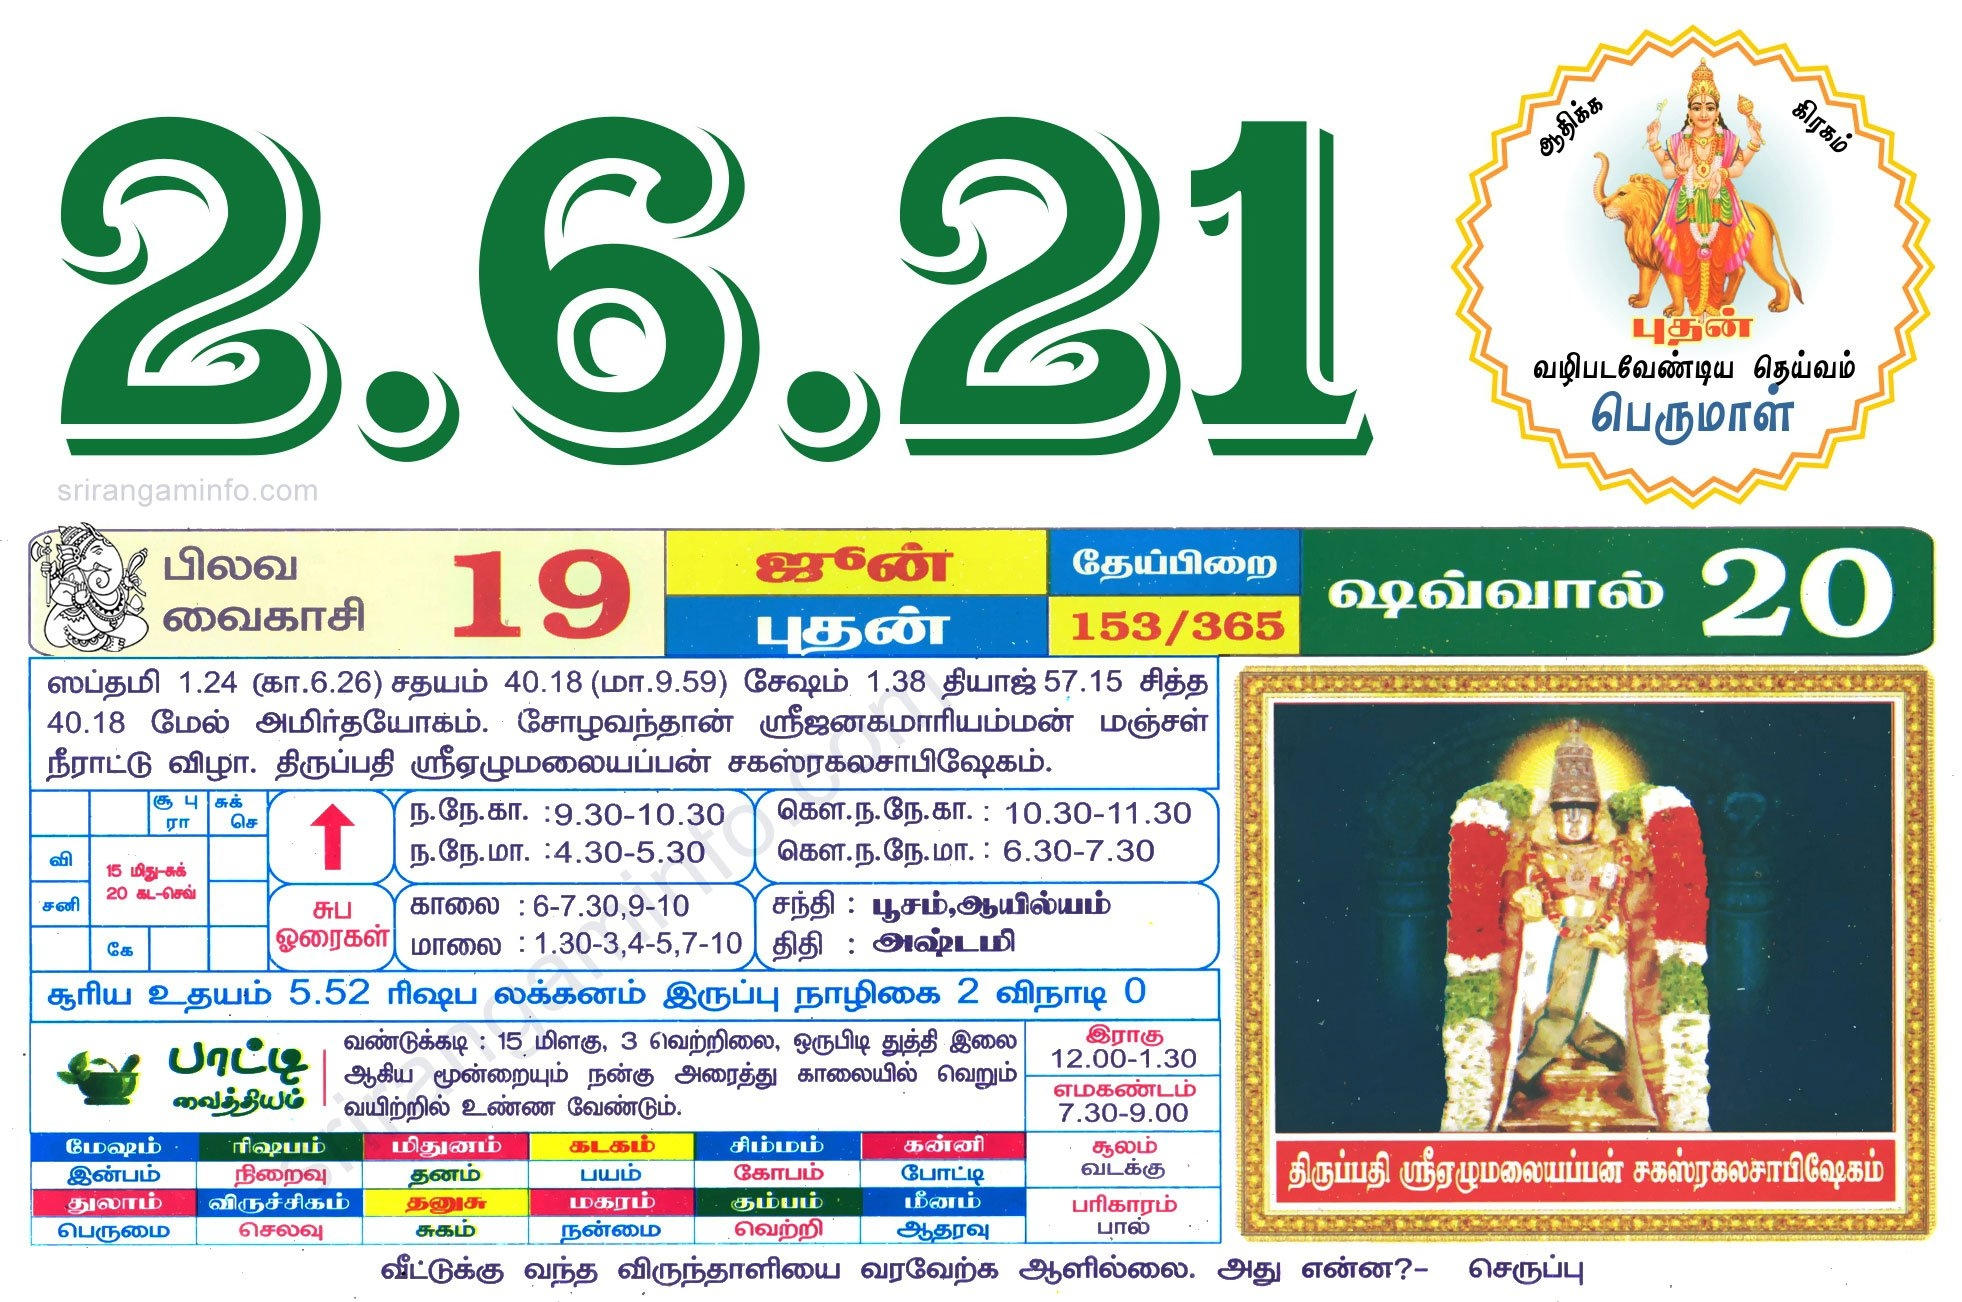 Tamil Daily Calendar 2021, Tamil Calendar 2021, Nalla Neram - தமிழ் தினசரி காலண்டர் pertaining to Tamil Calendar 2021 Photos